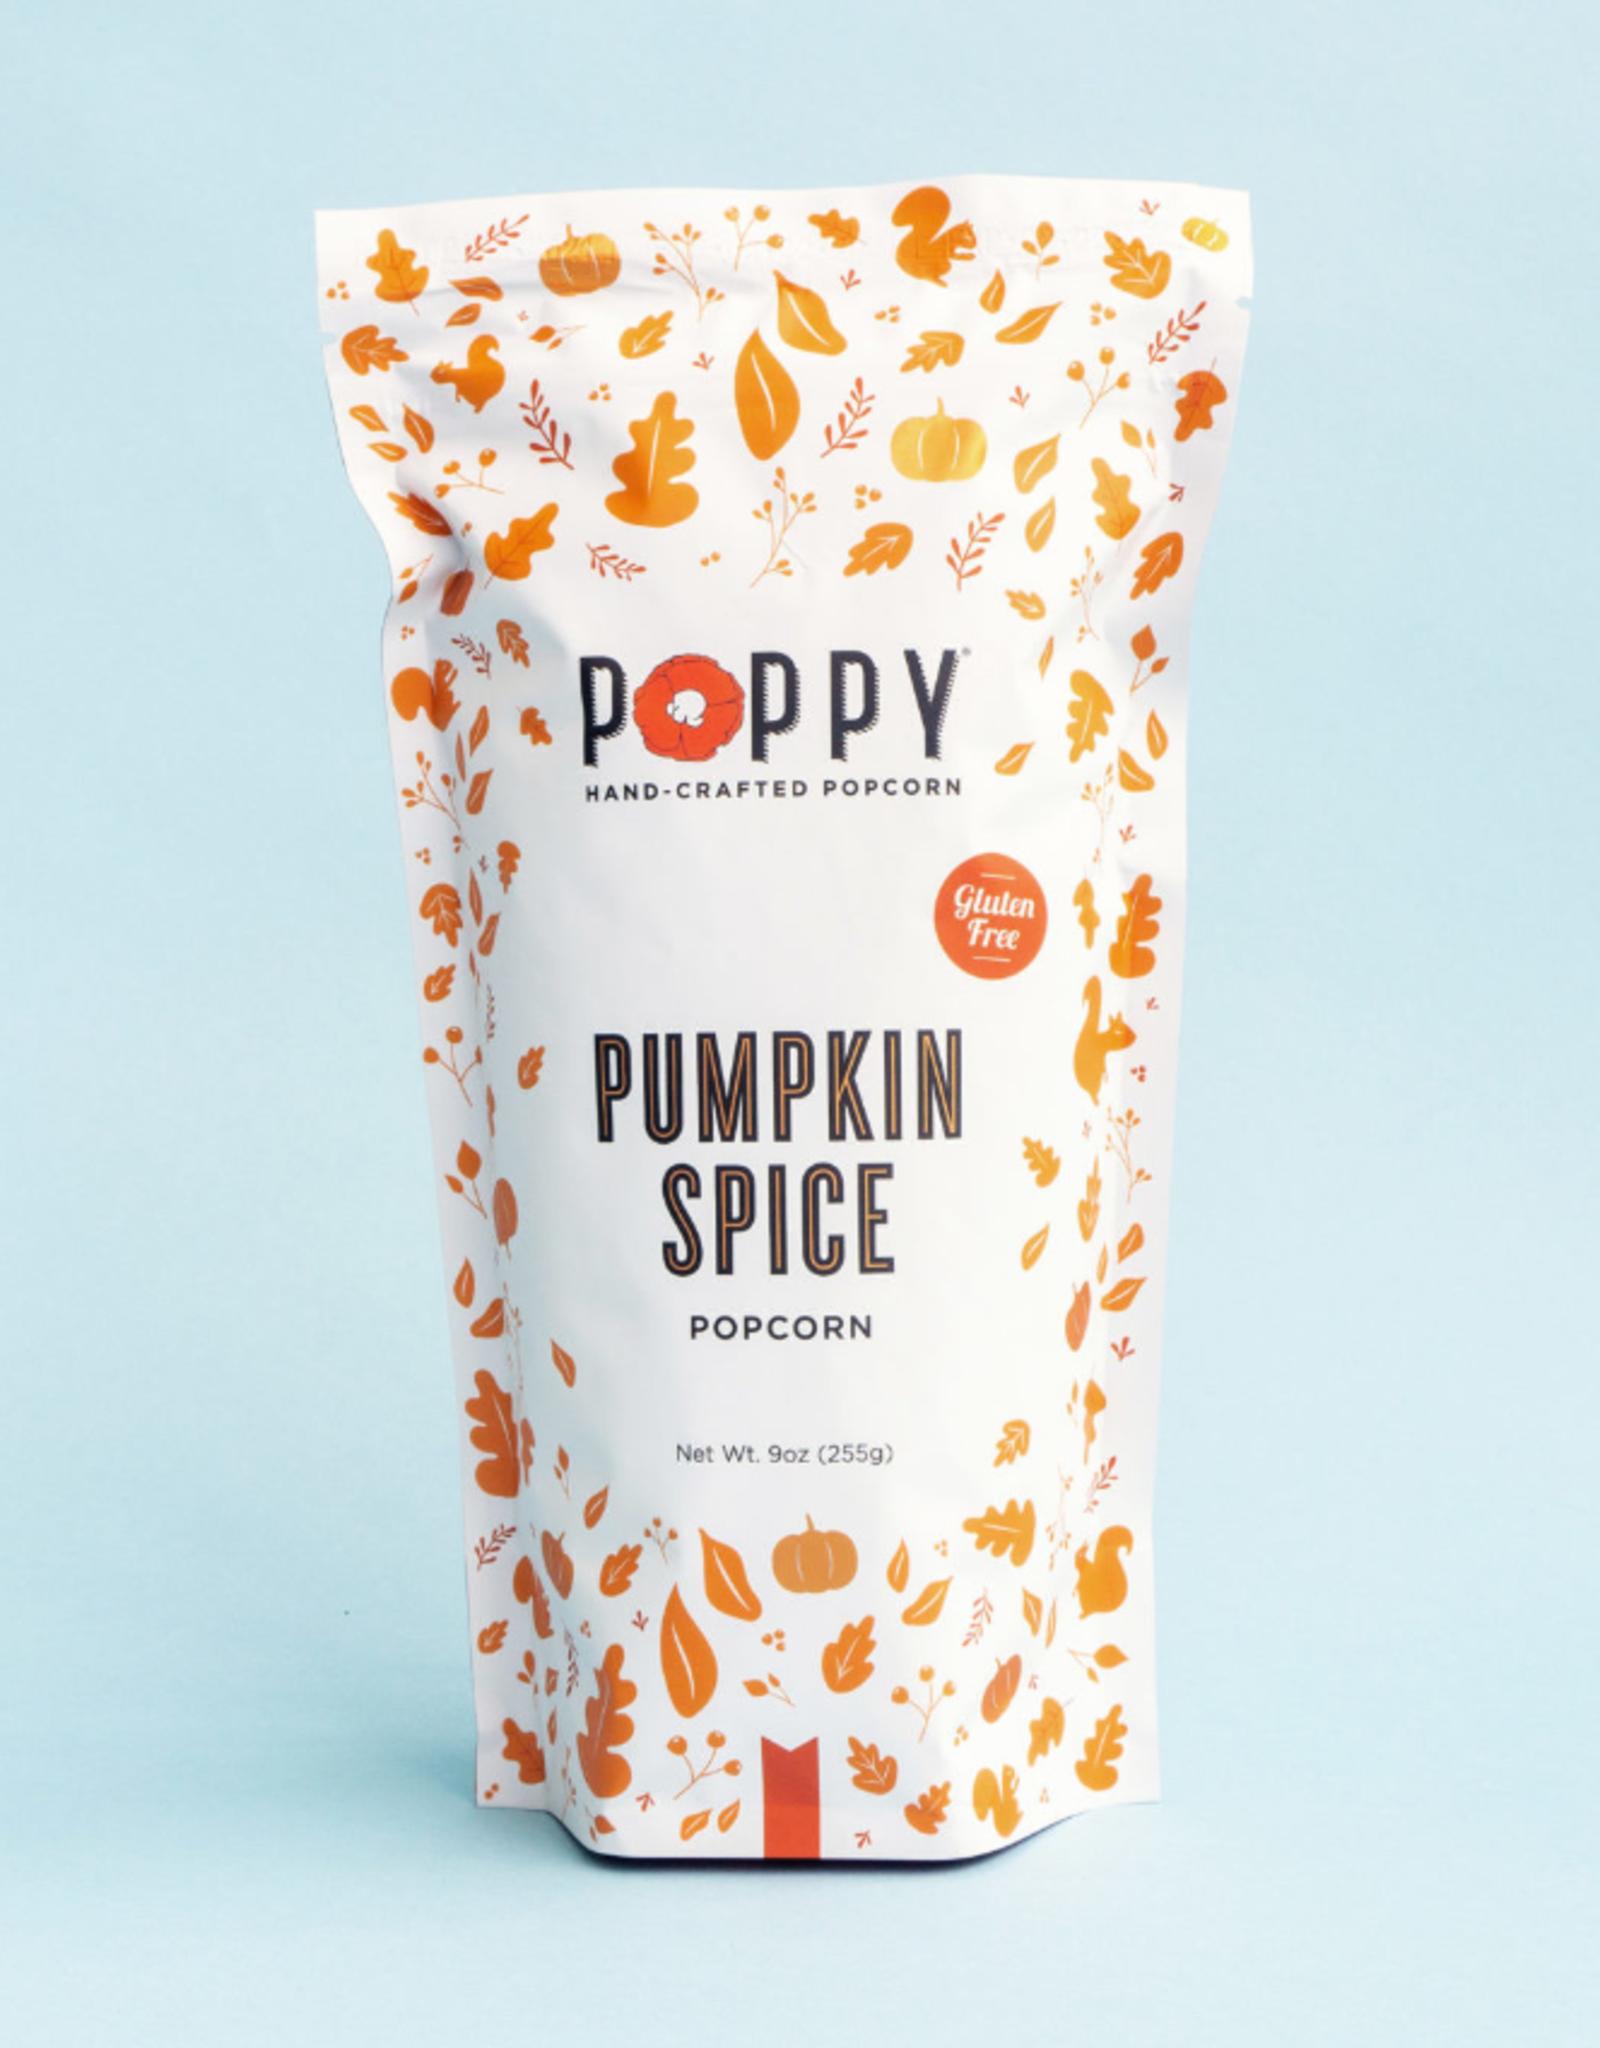 Poppy Pumpkin Spice Popcorn